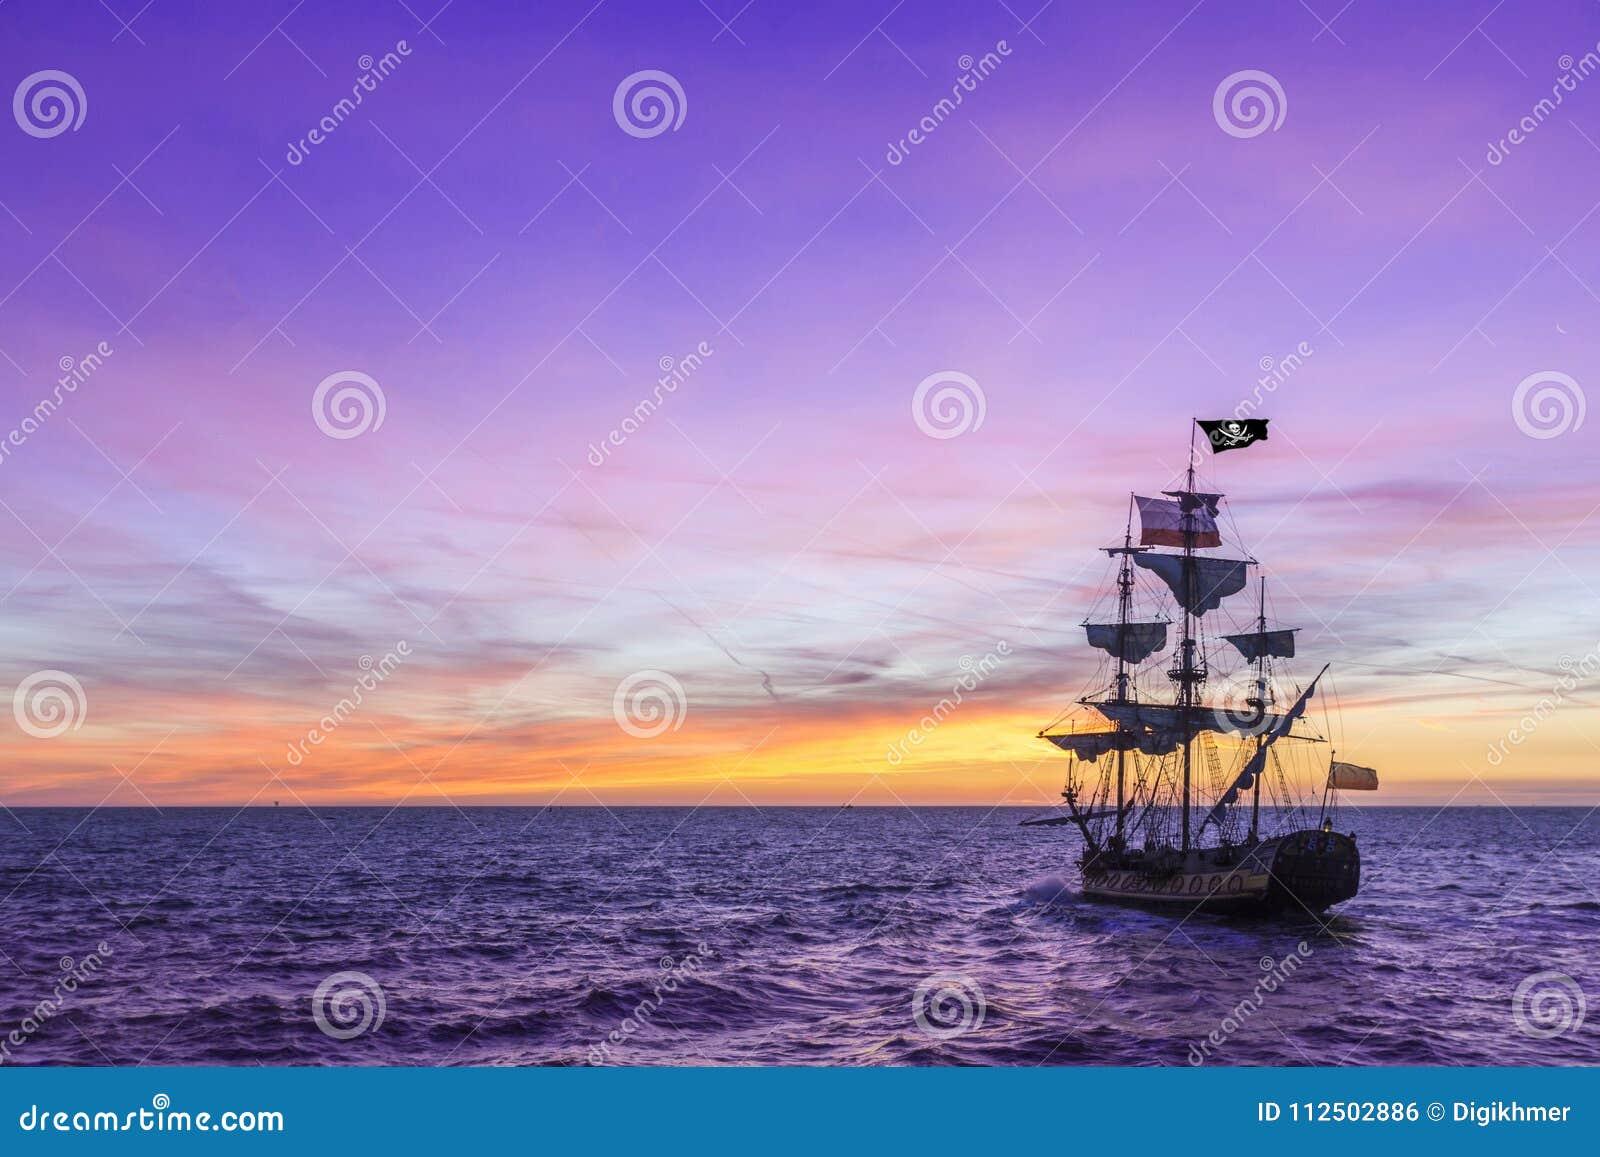 Pirate Ship under a violet sky